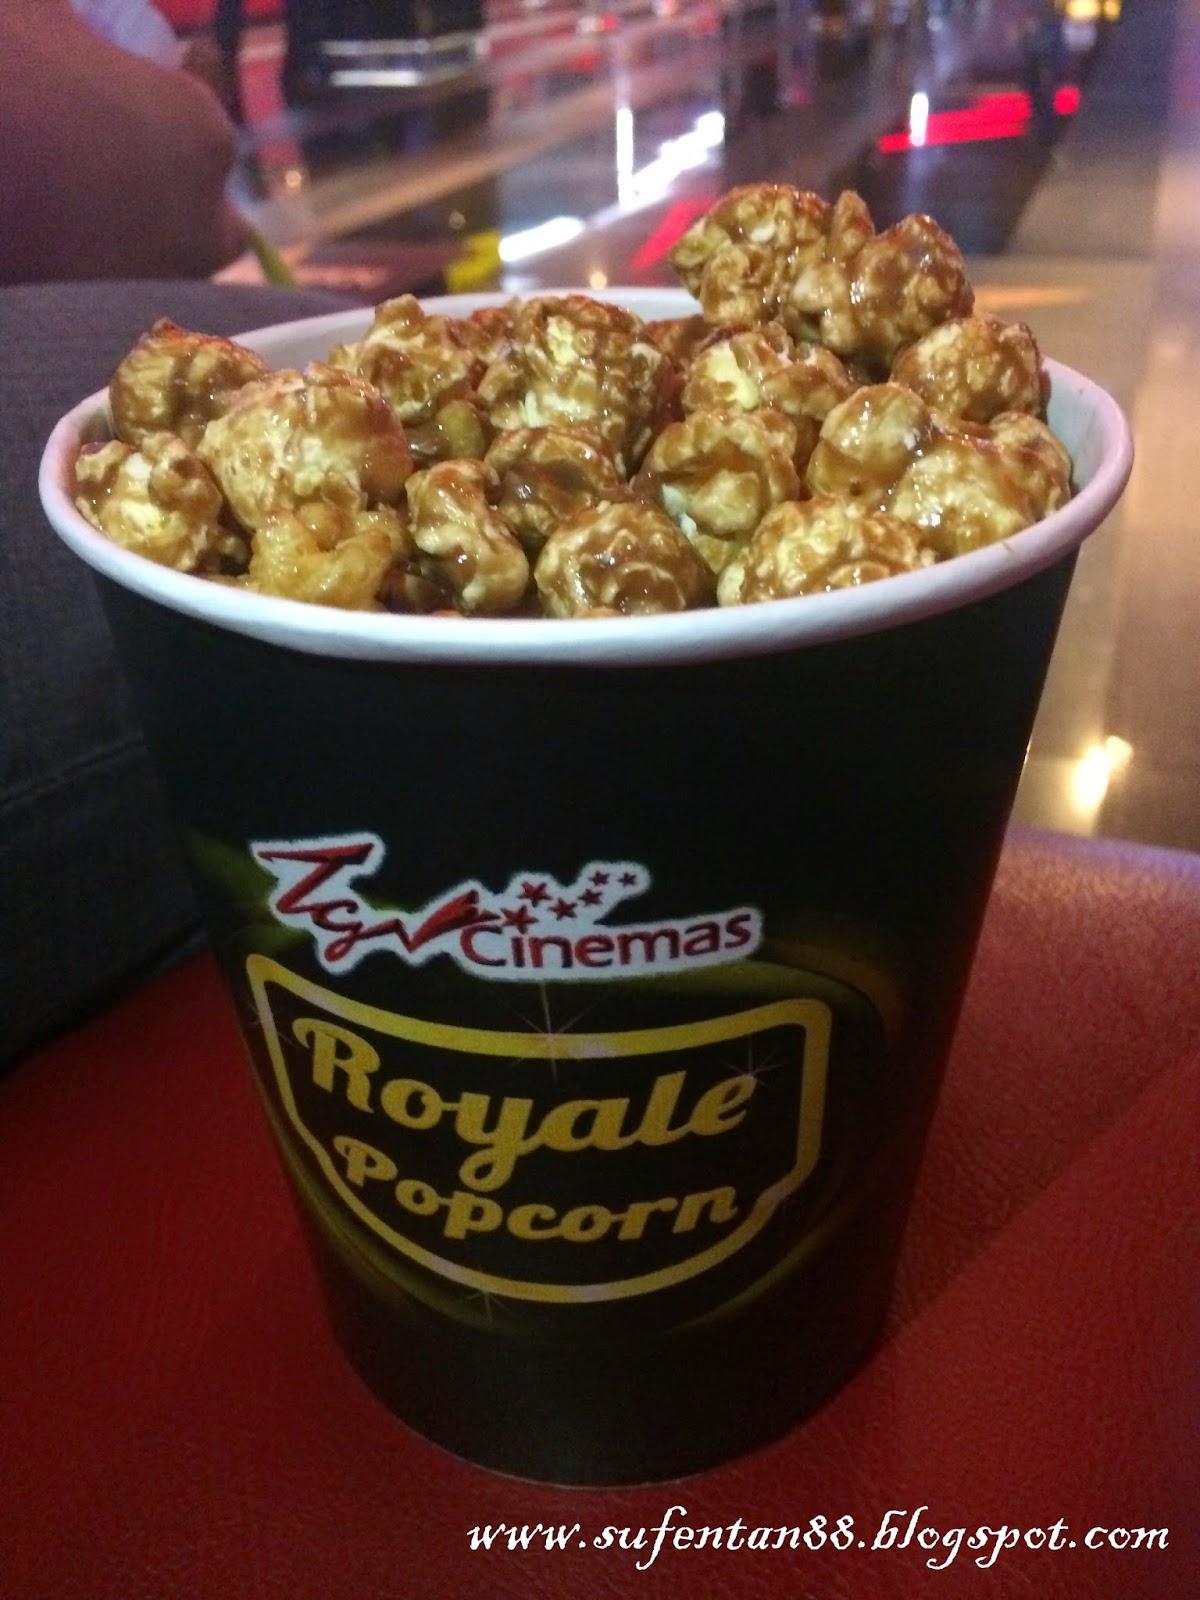 Royale Popcorn Tgv Cinema Sufentan Com